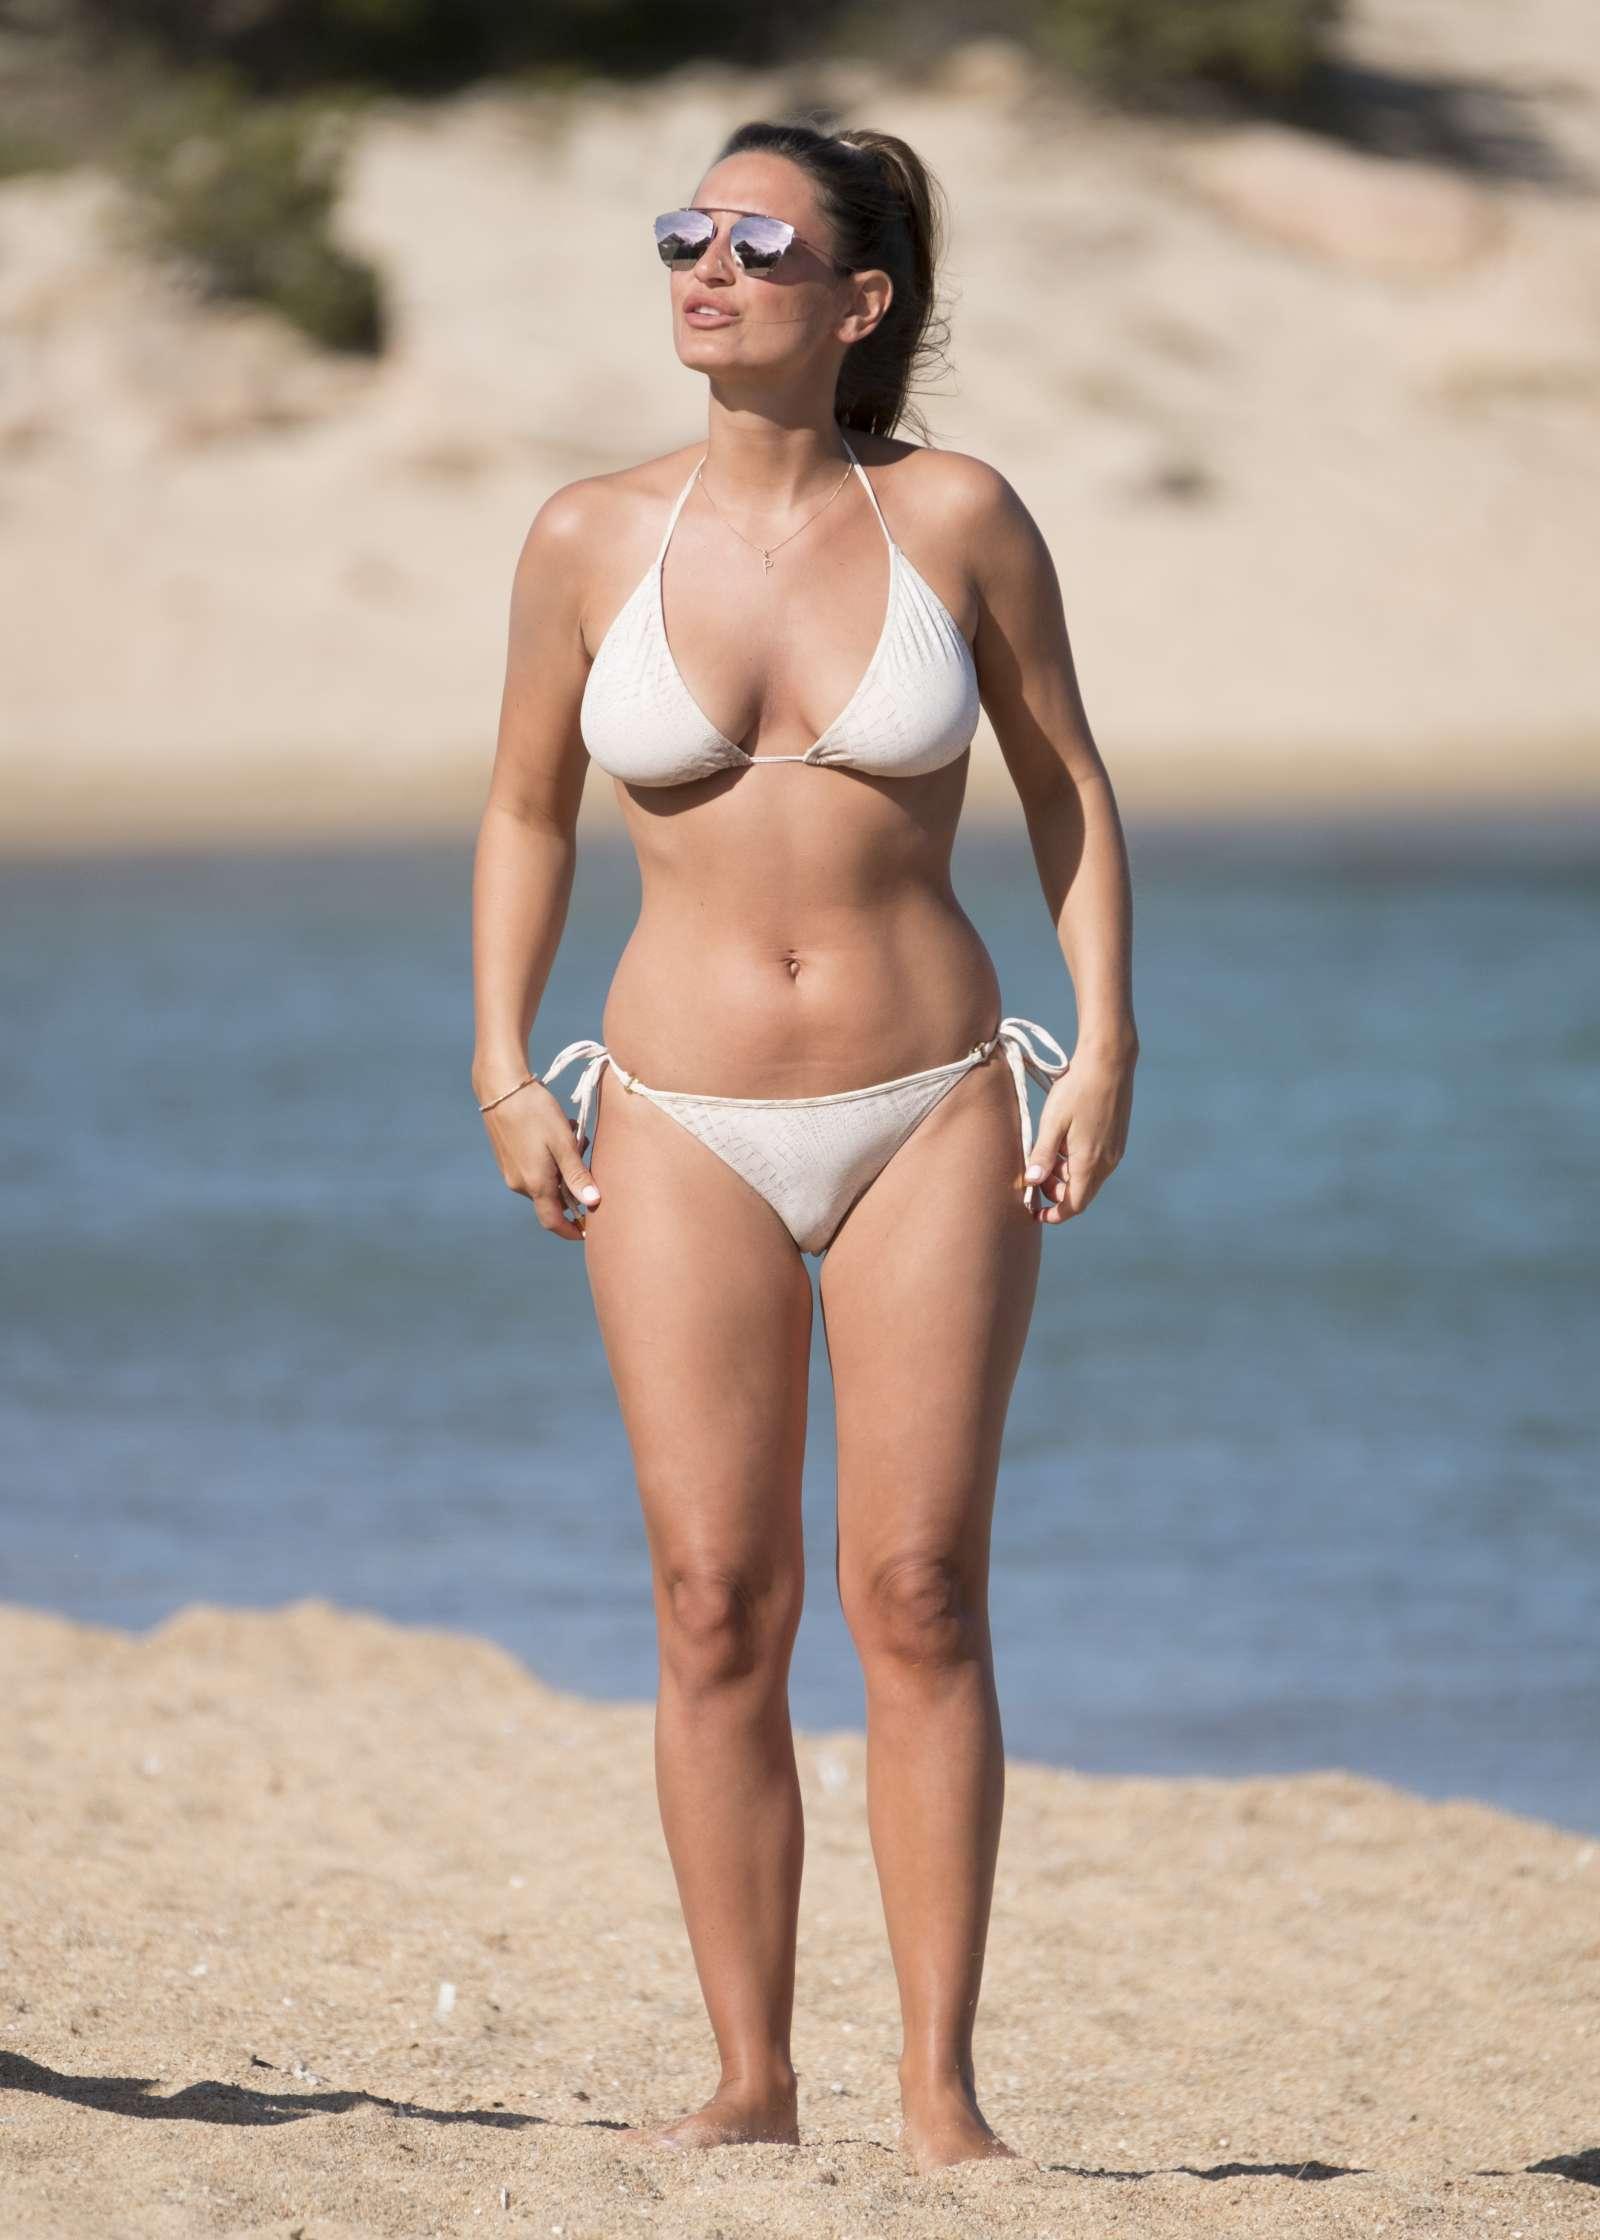 Thanks sam faiers bikini body agree, the